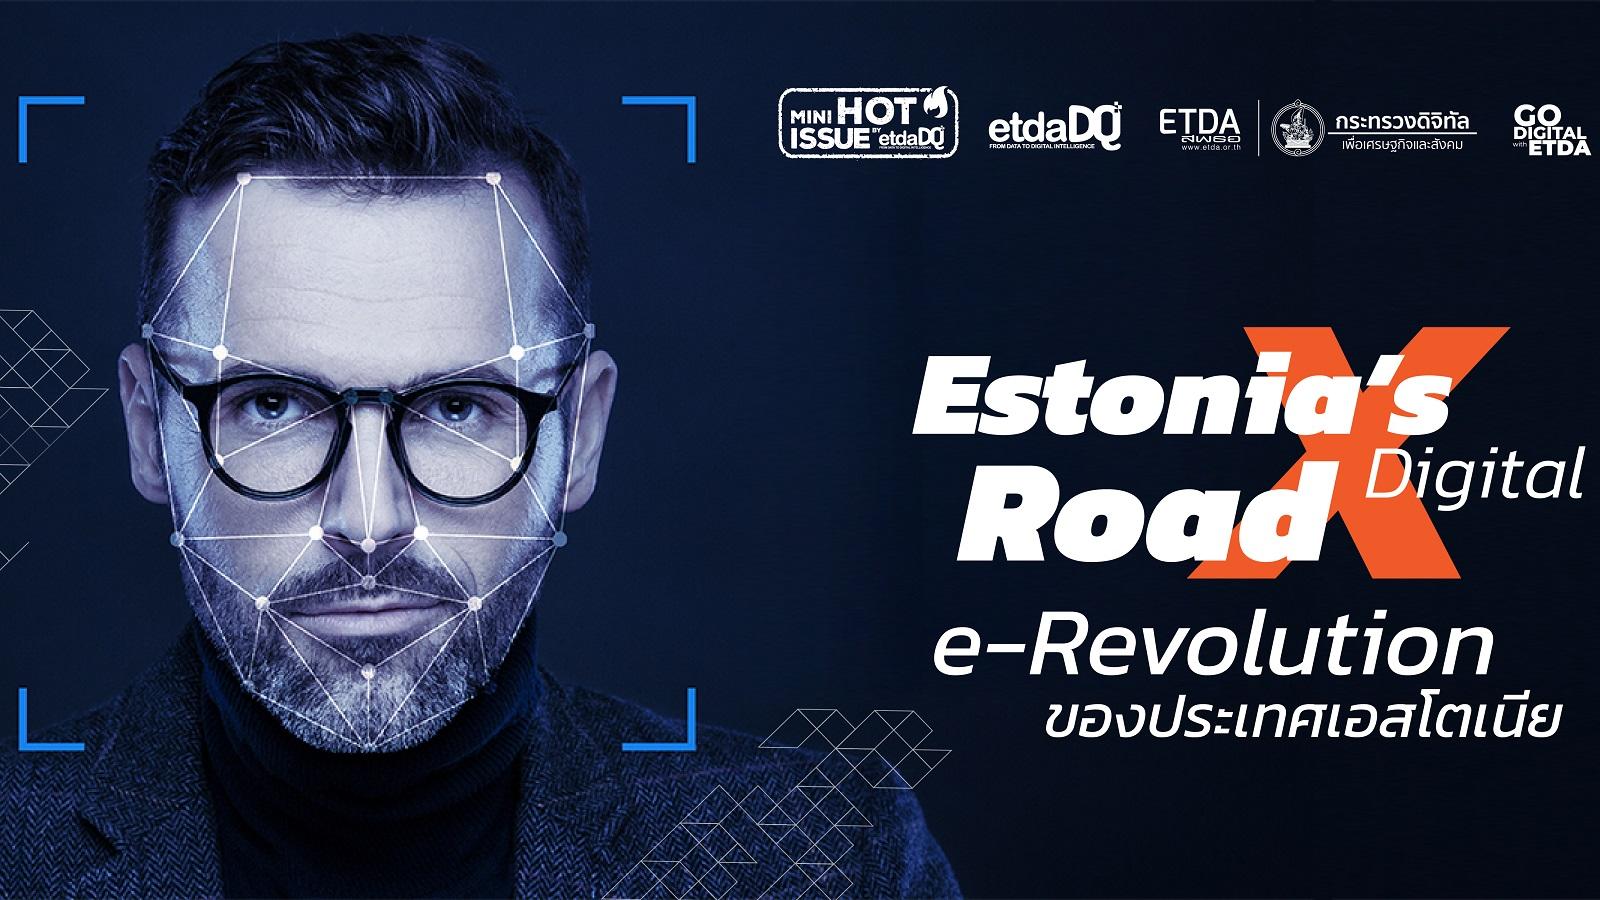 Estonia's Digital X Road: e-Revolution ของประเทศเอสโตเนีย